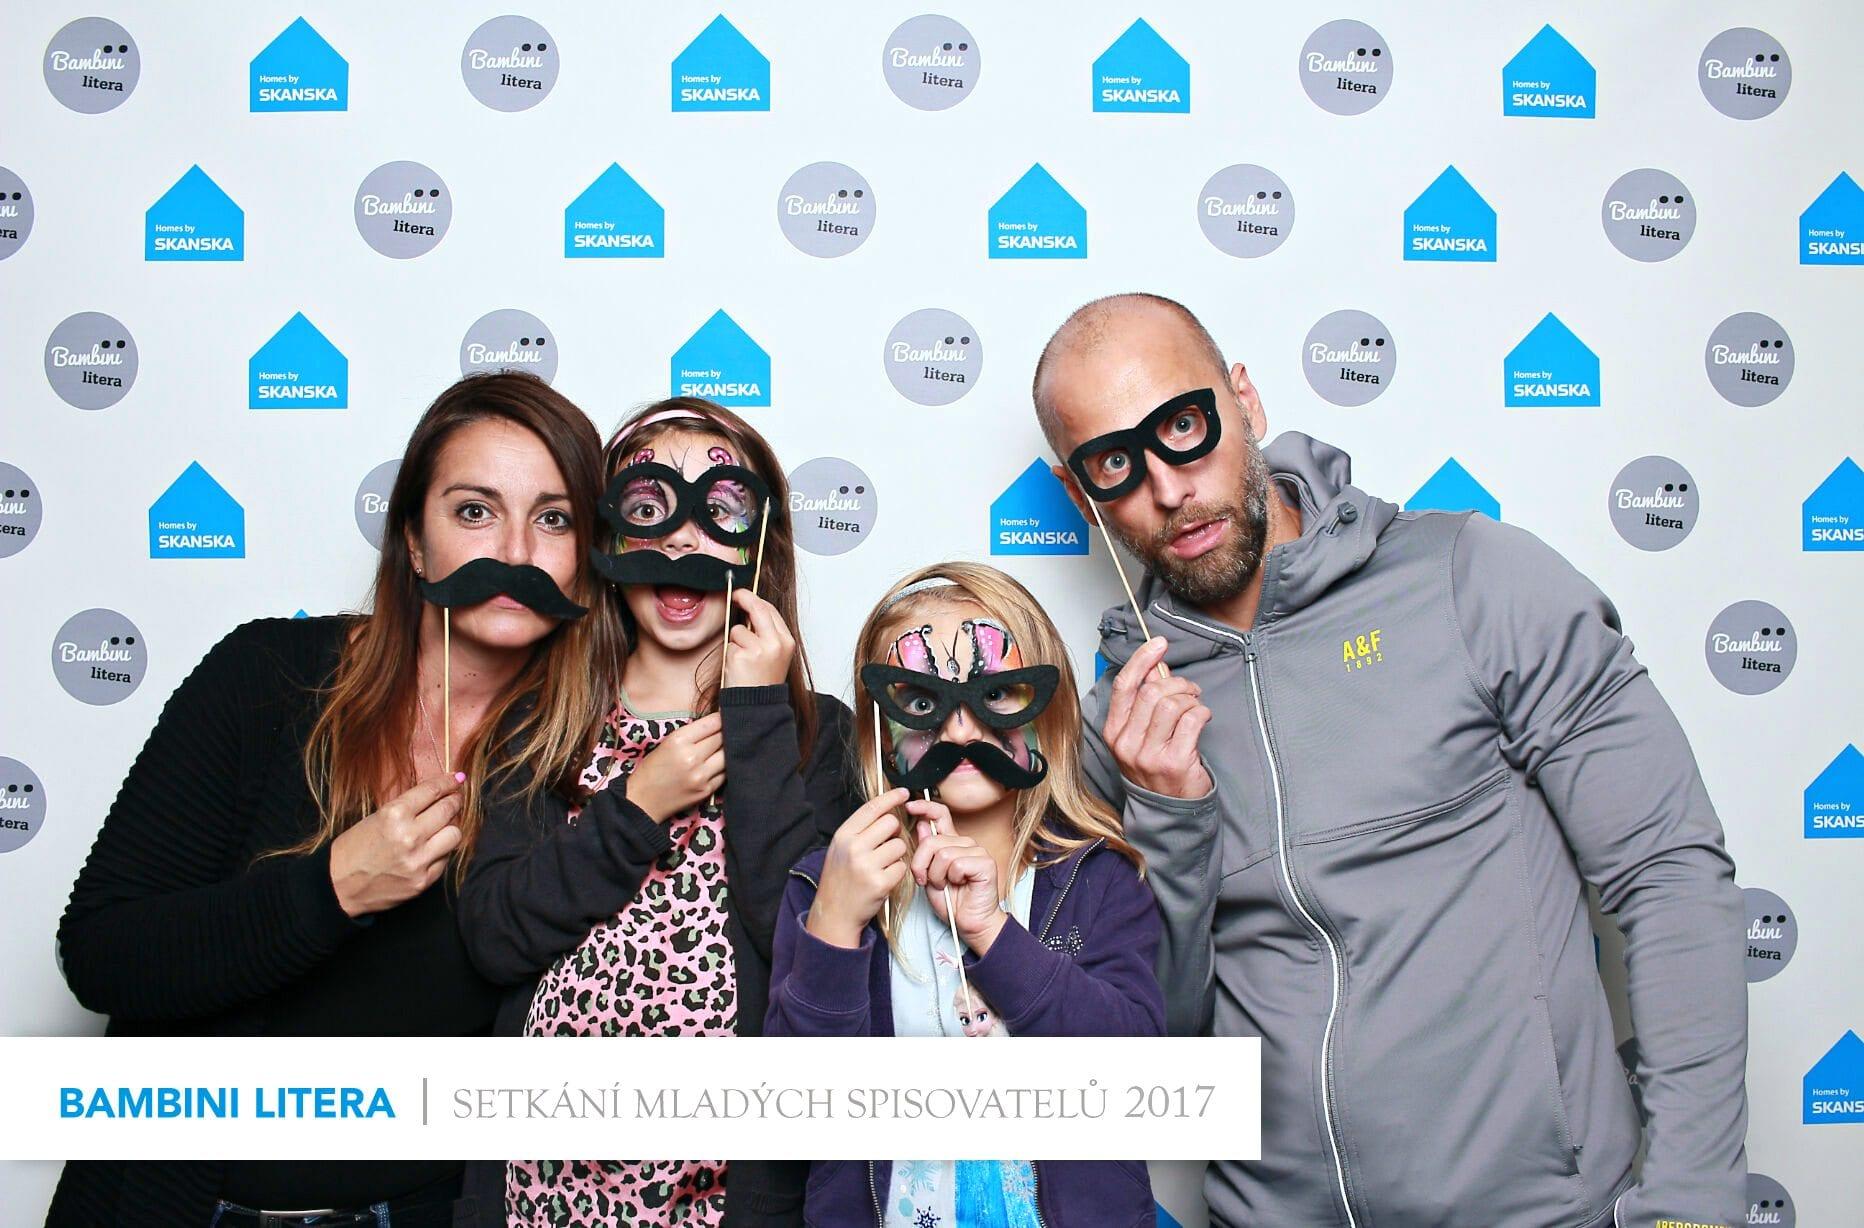 fotokoutek-skanska-bambini-litera-2-9-2017-300878